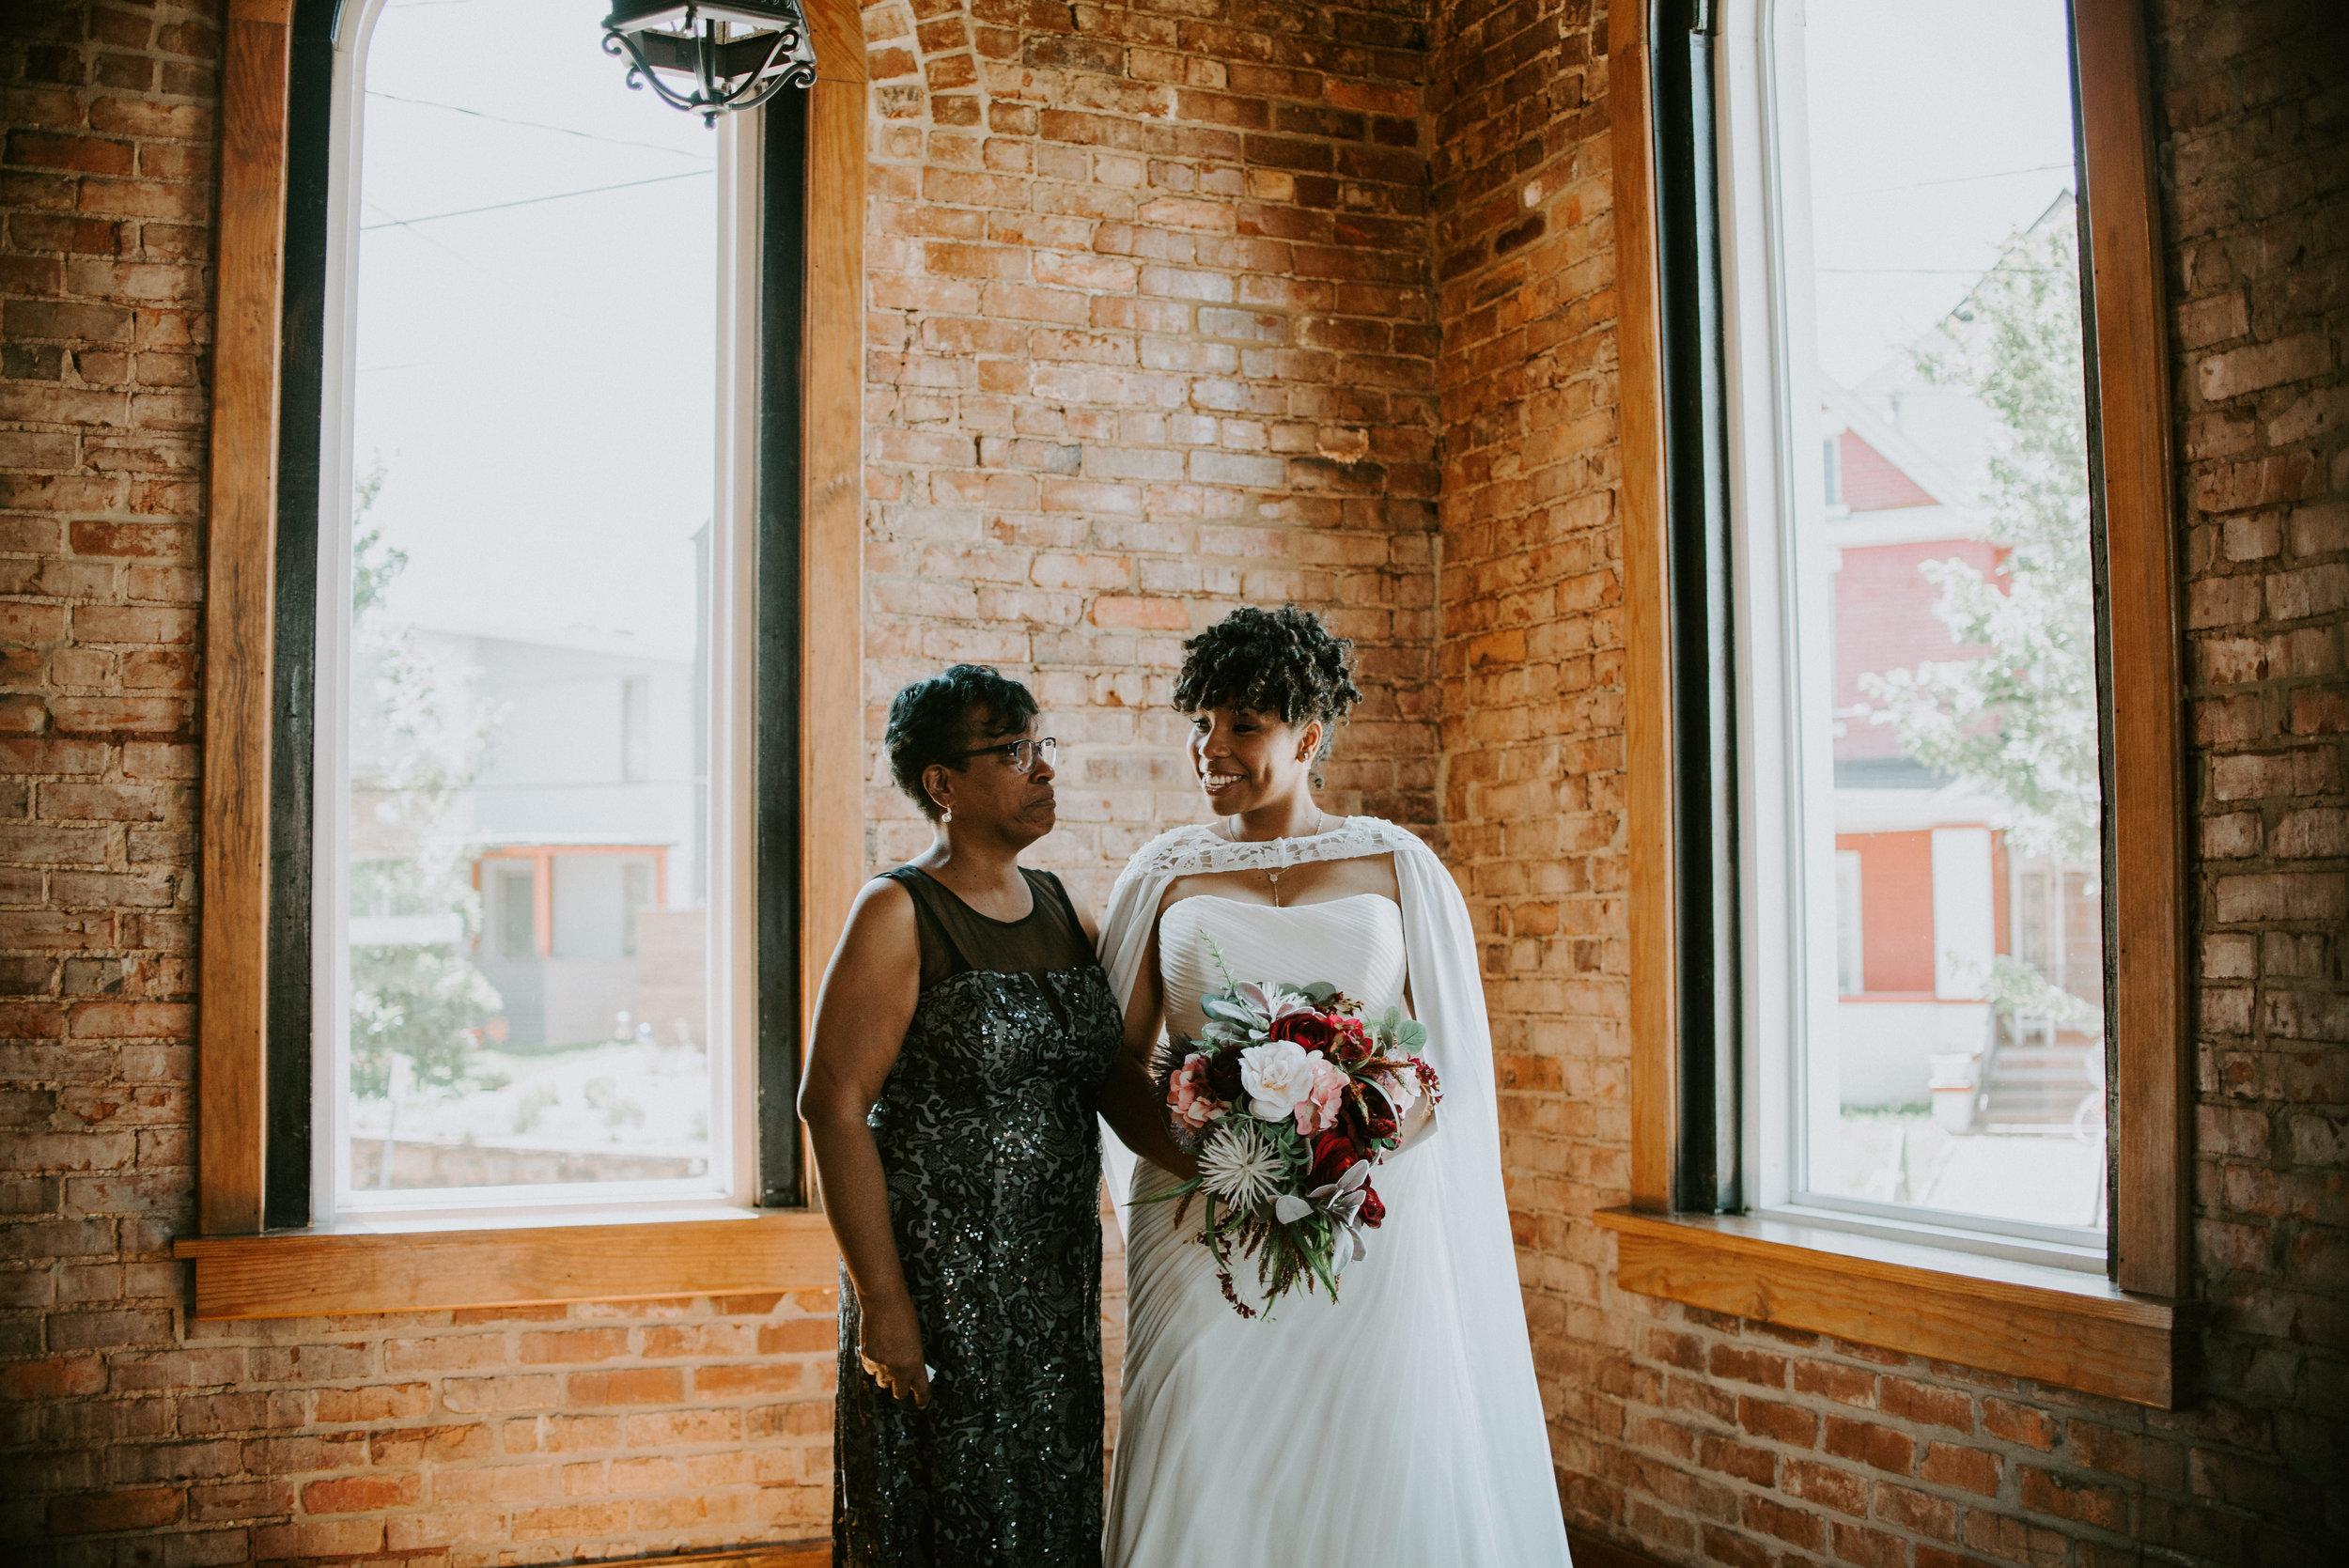 WonderlyCreative_Wedding_6.7.18_Khara&Dwayne_-251.jpg